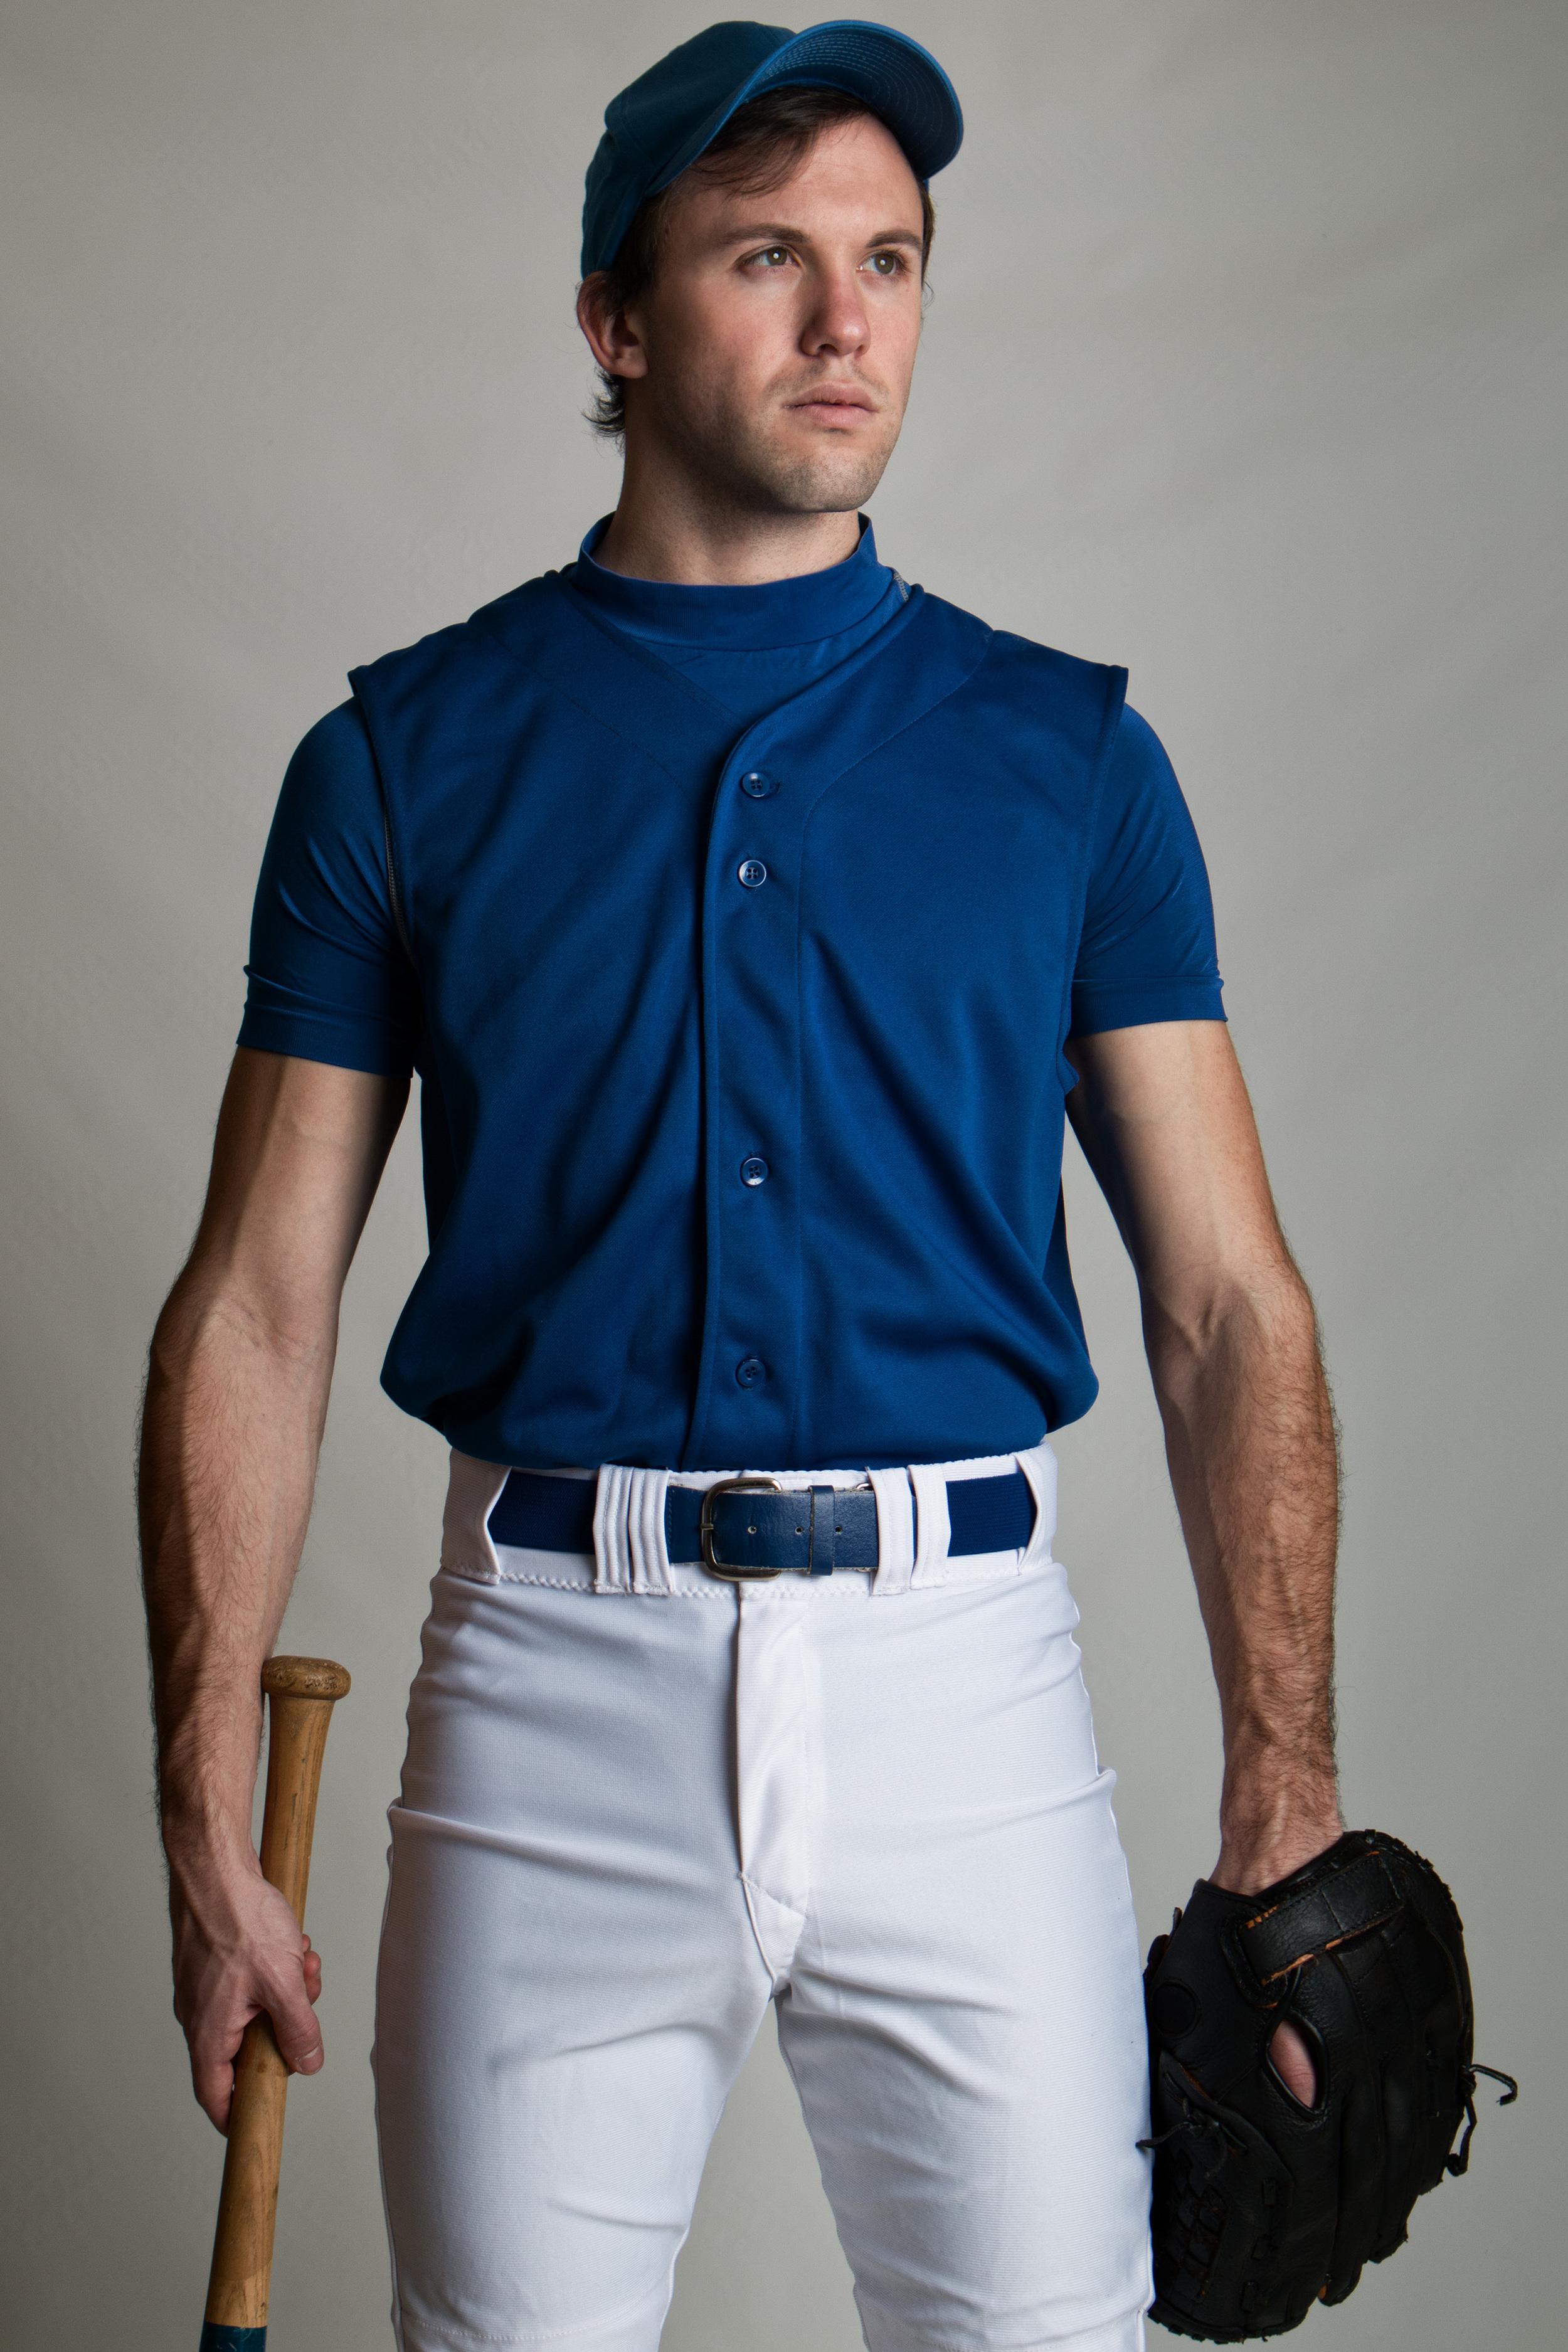 blue baseball jersey.jpg